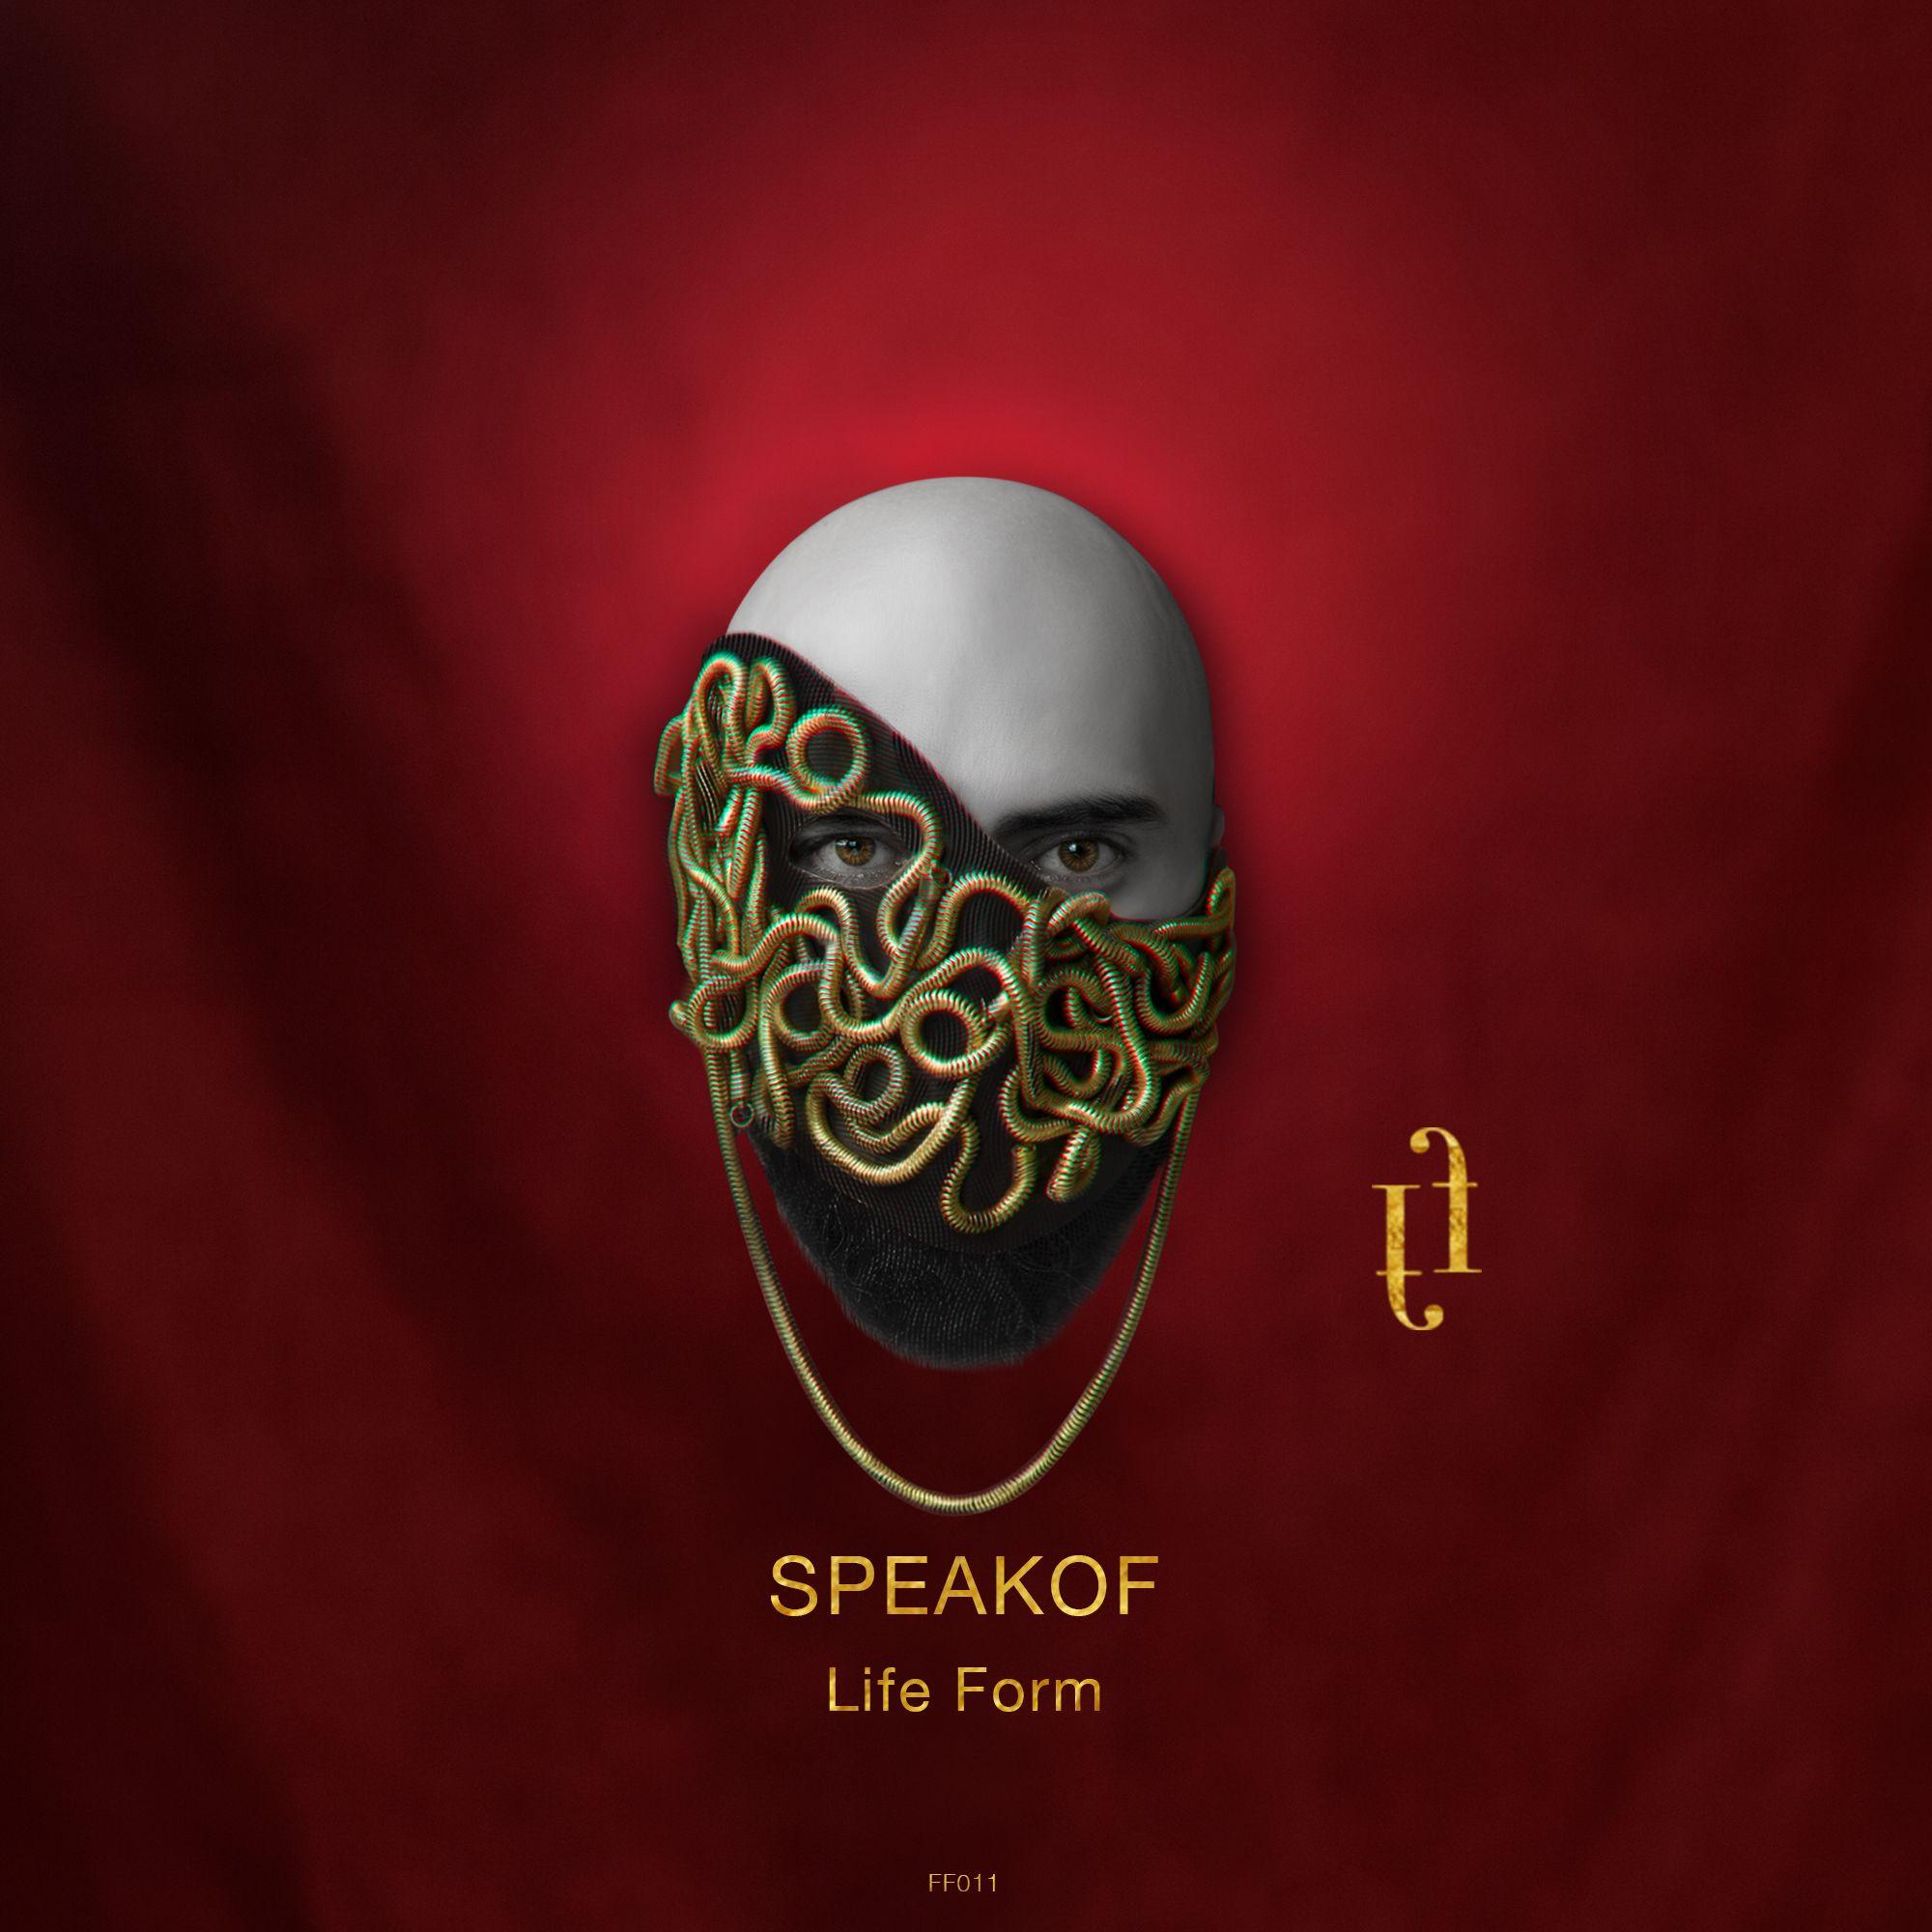 ff011_speakof_-_life_form_ep_coverart.jpg